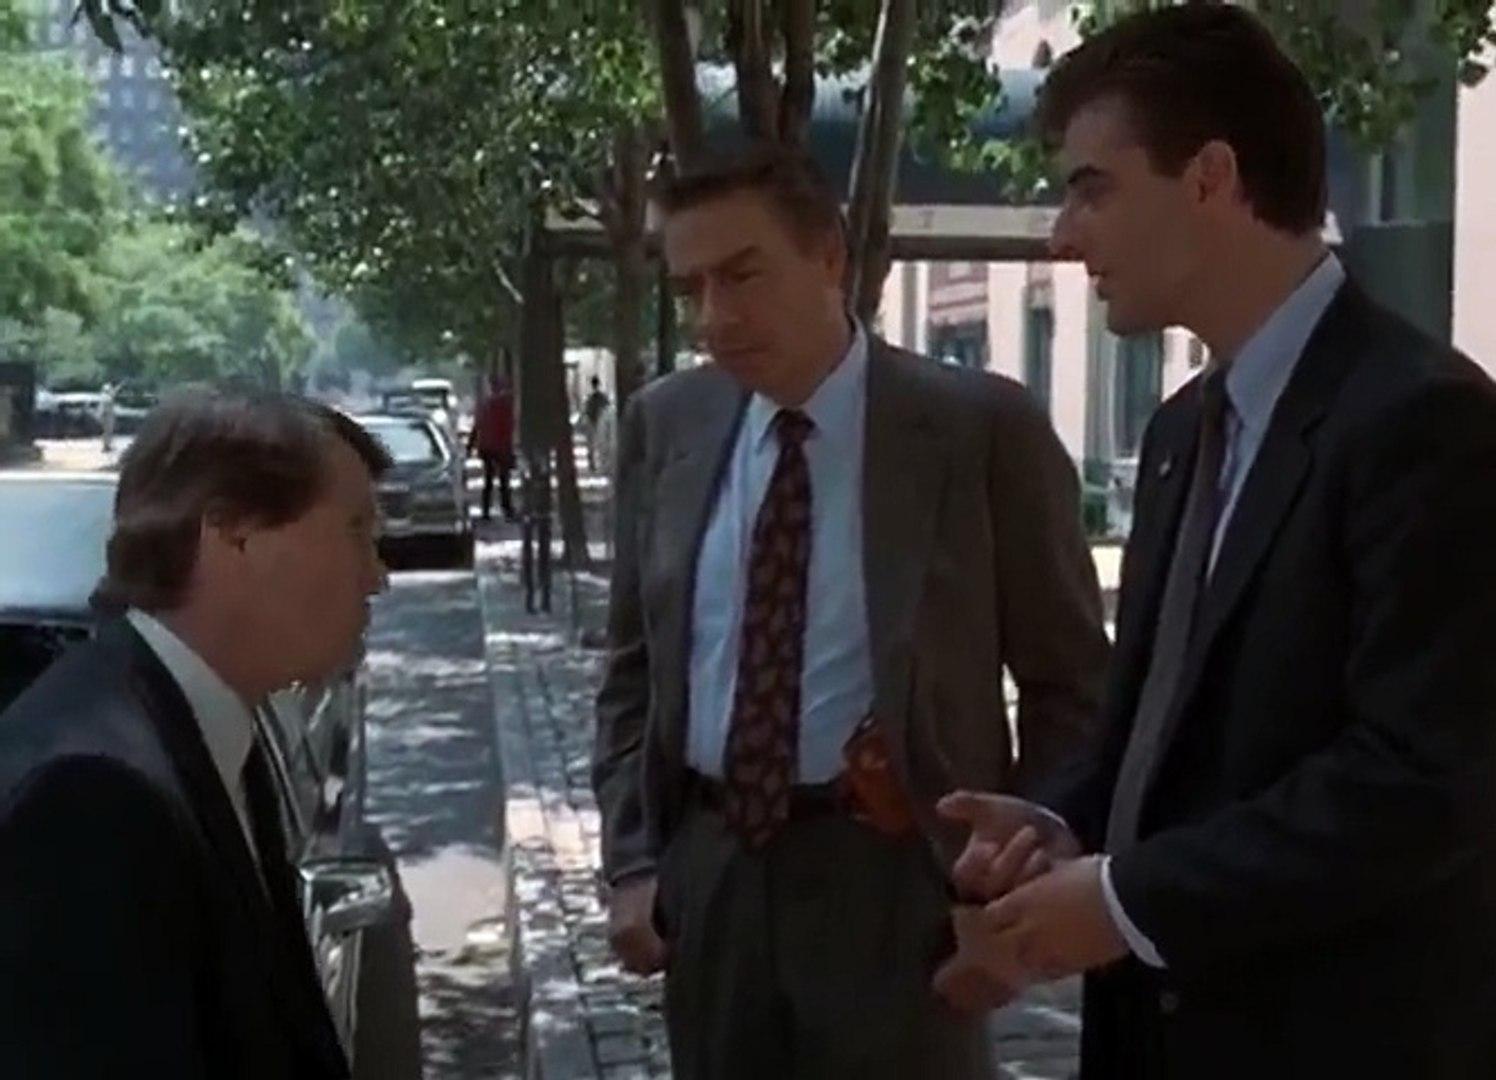 Law & Order S04 - Ep05 Black Tie HD Watch